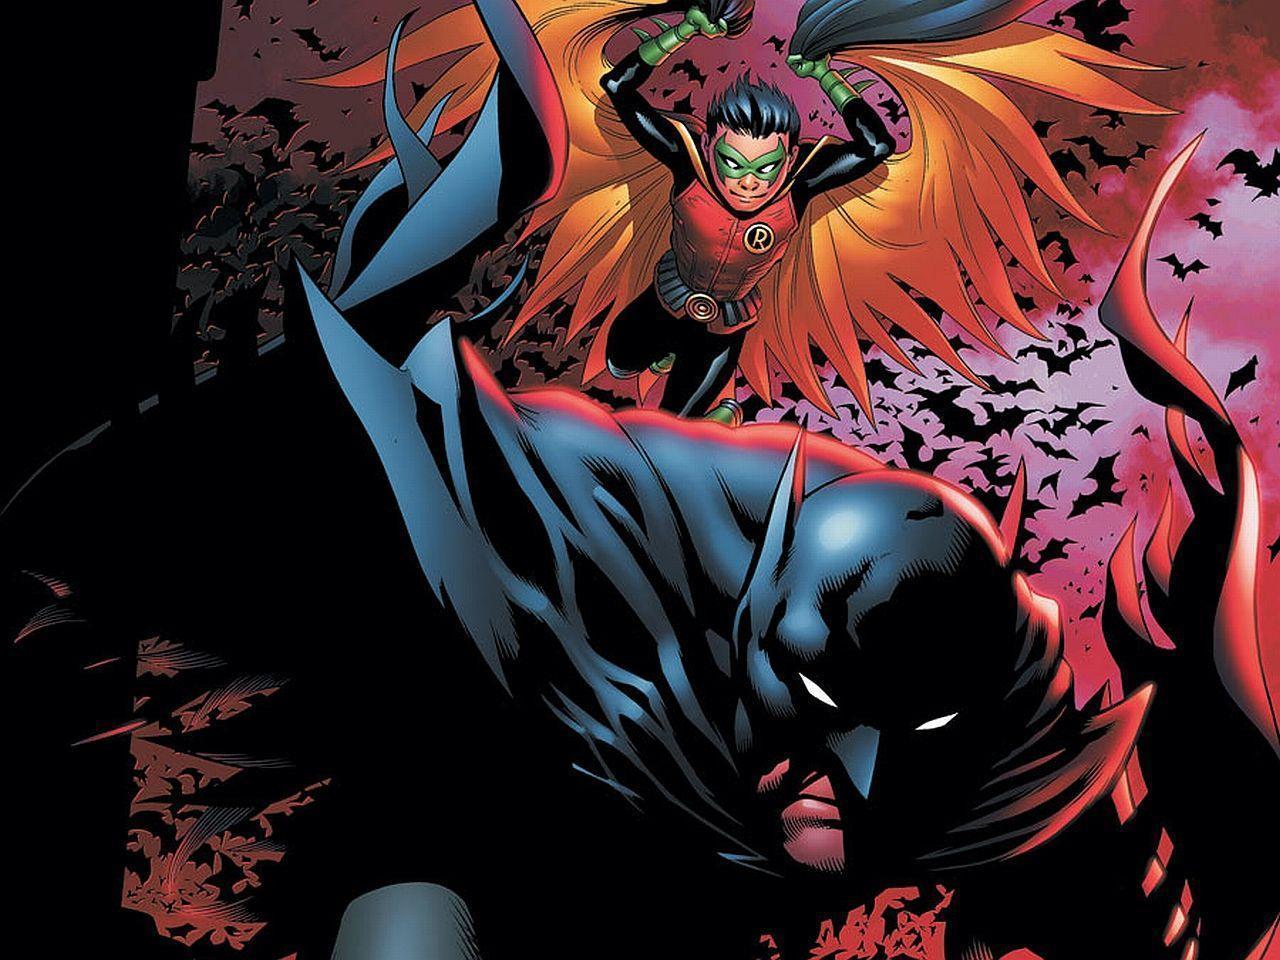 67 Batman & Robin HD Wallpapers | Backgrounds - Wallpaper Abyss ...